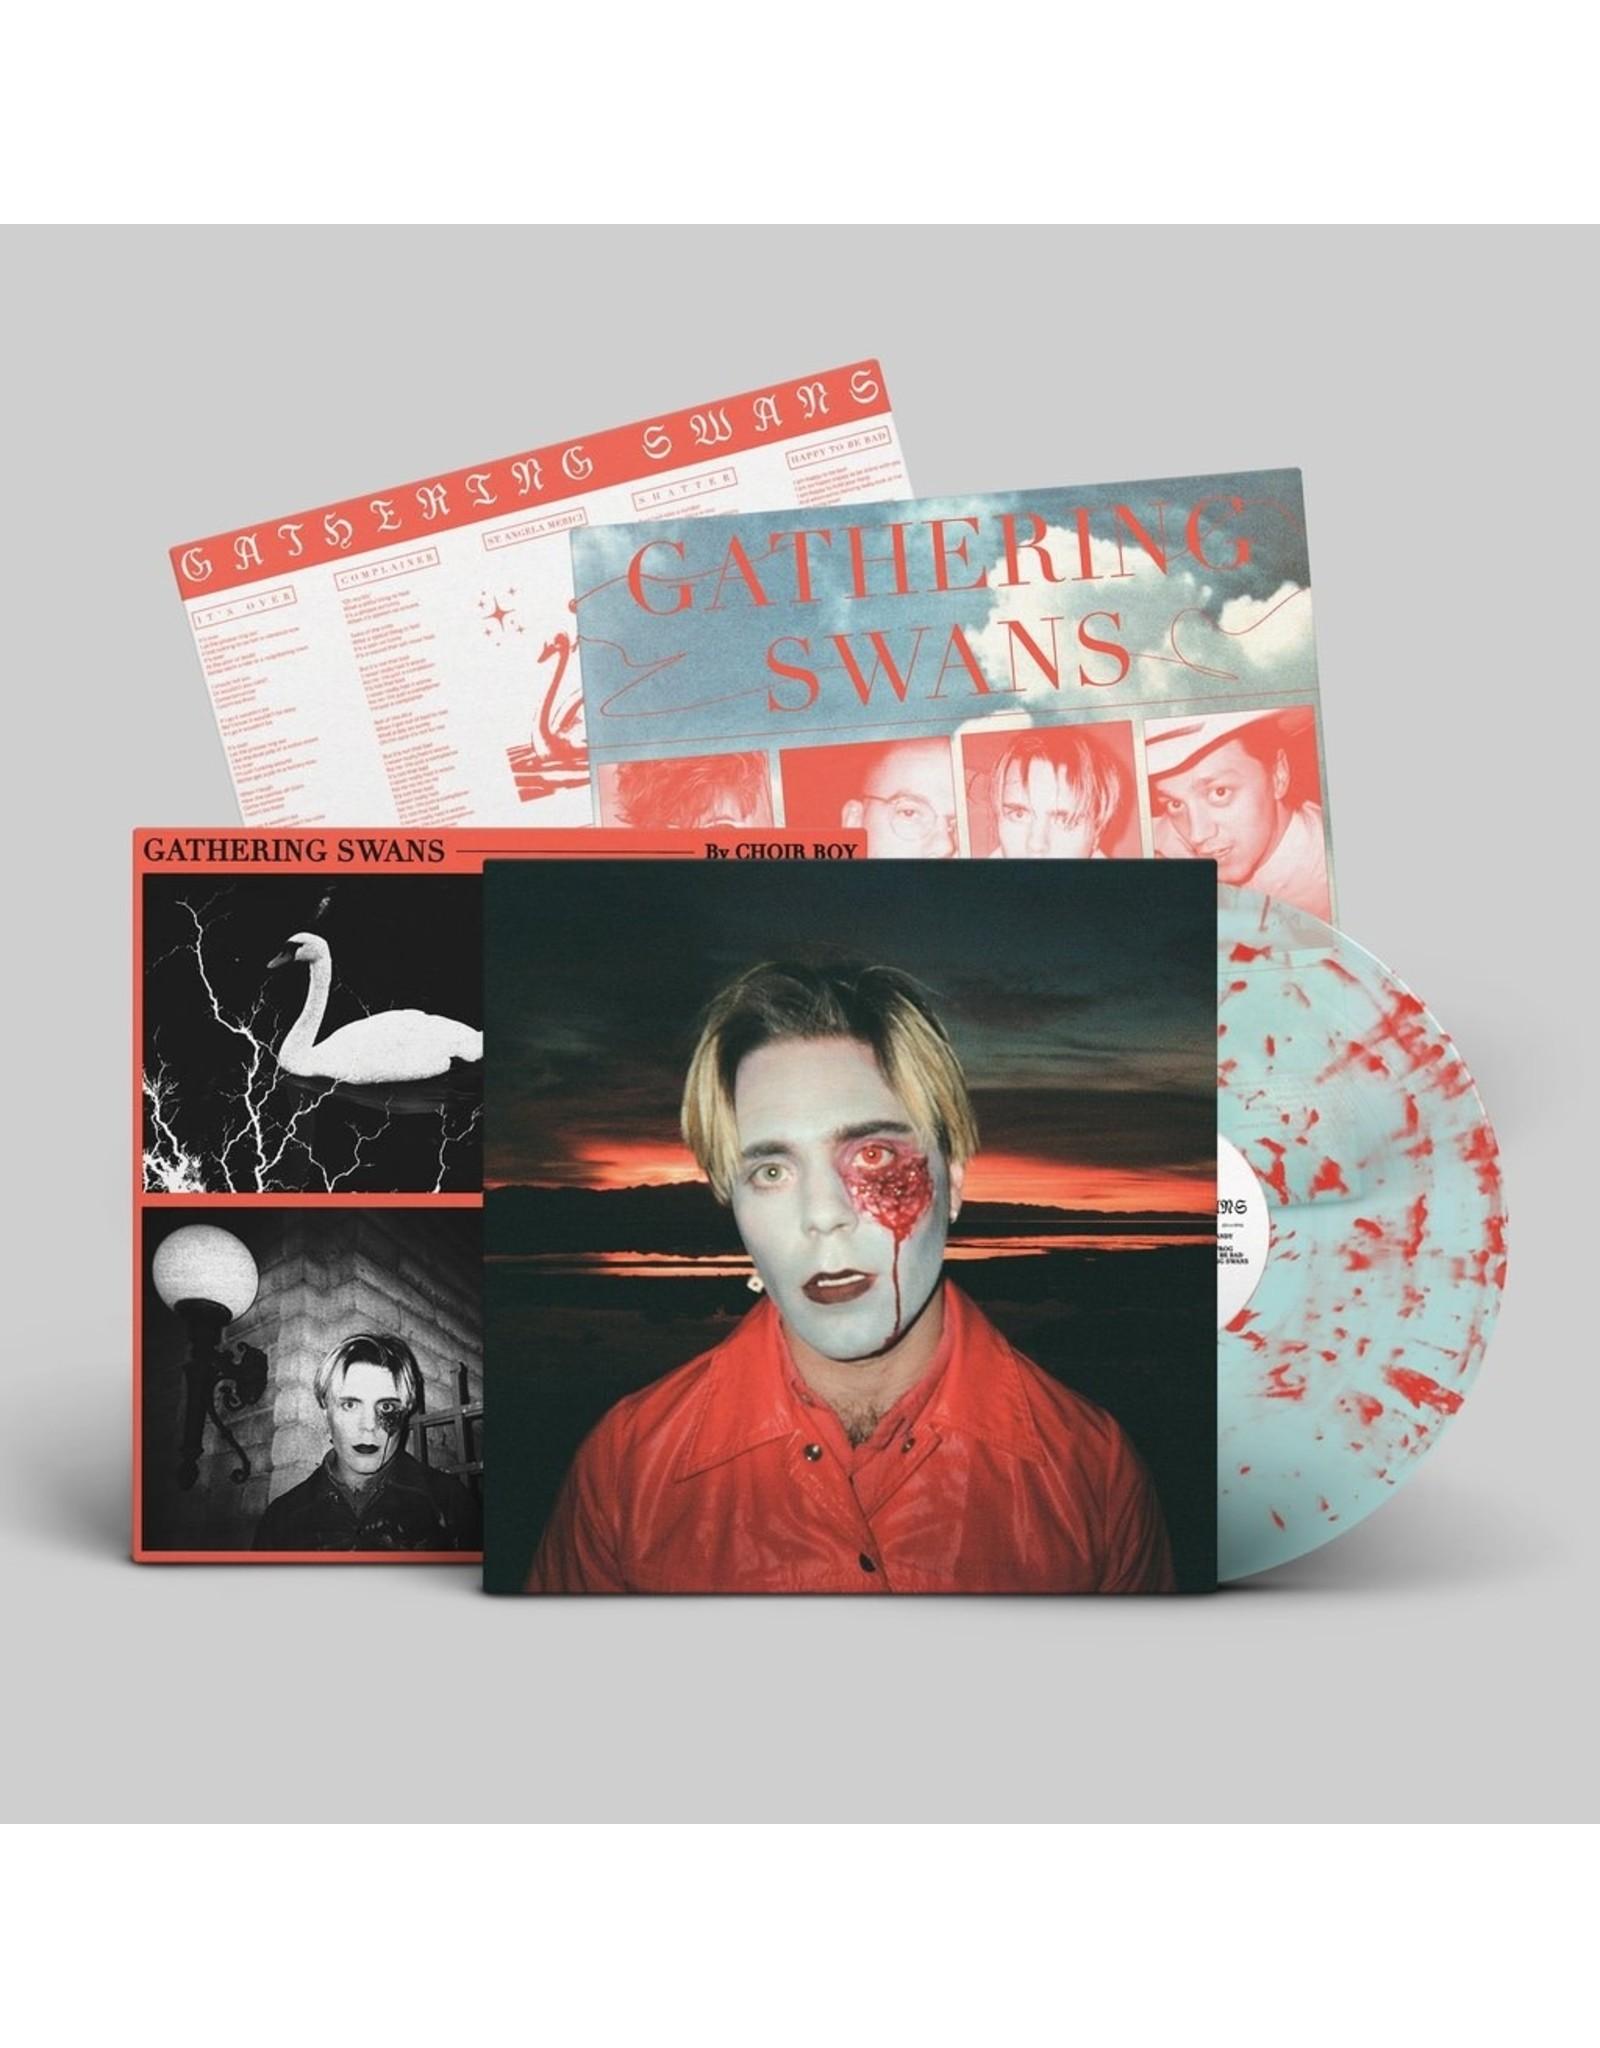 Choir Boy - Gathering Swans (Exclusive Splatter Vinyl)